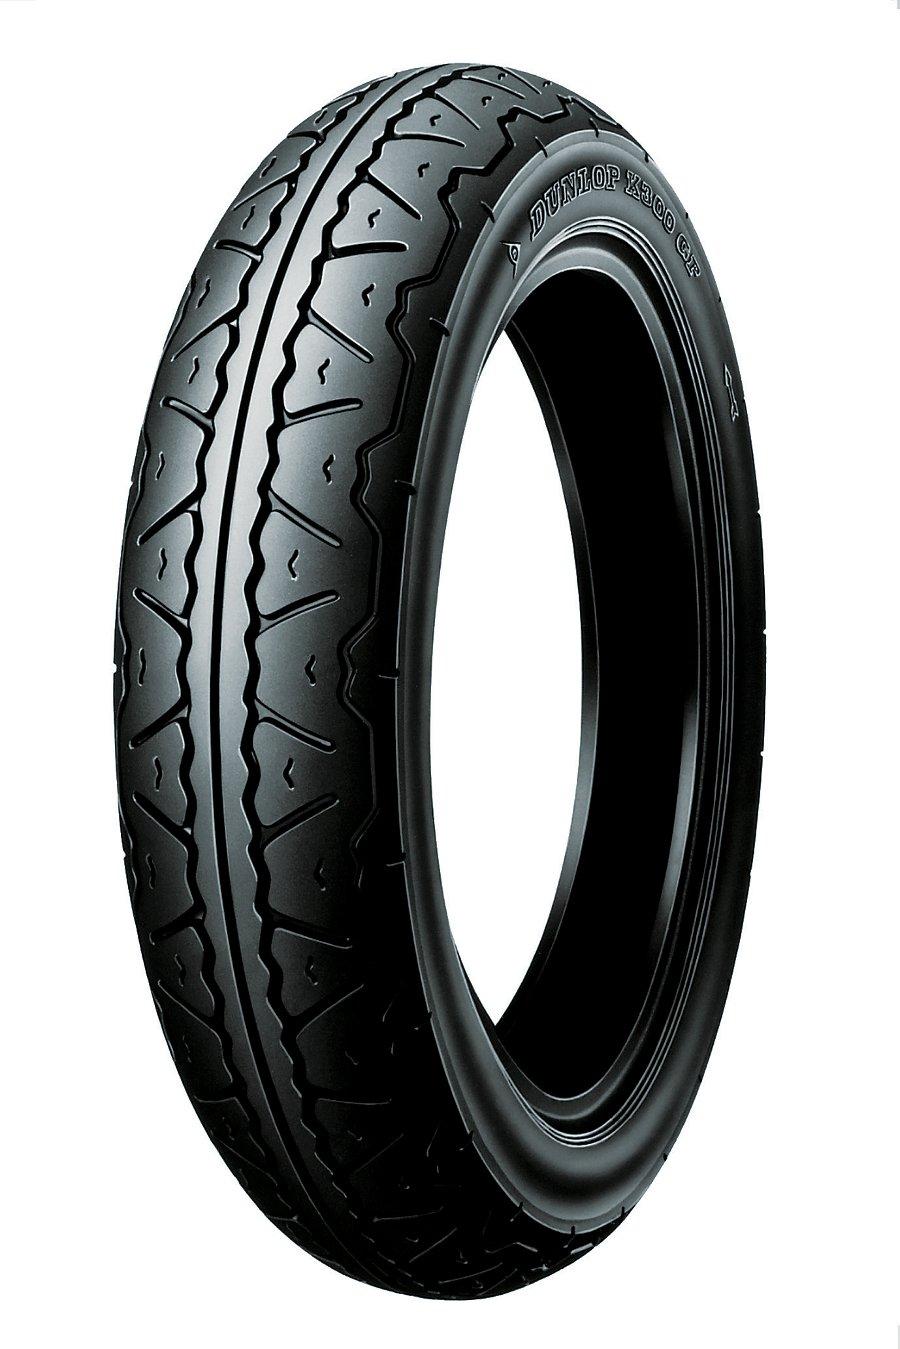 DUNLOP(ダンロップ) バイクタイヤ GP SERIES K300GP フロント 120/80-16 M/C 60V チューブレスタイプ(TL) 251609 二輪 オートバイ用 B001OXMBTK 120/80-16|フロント  120/80-16